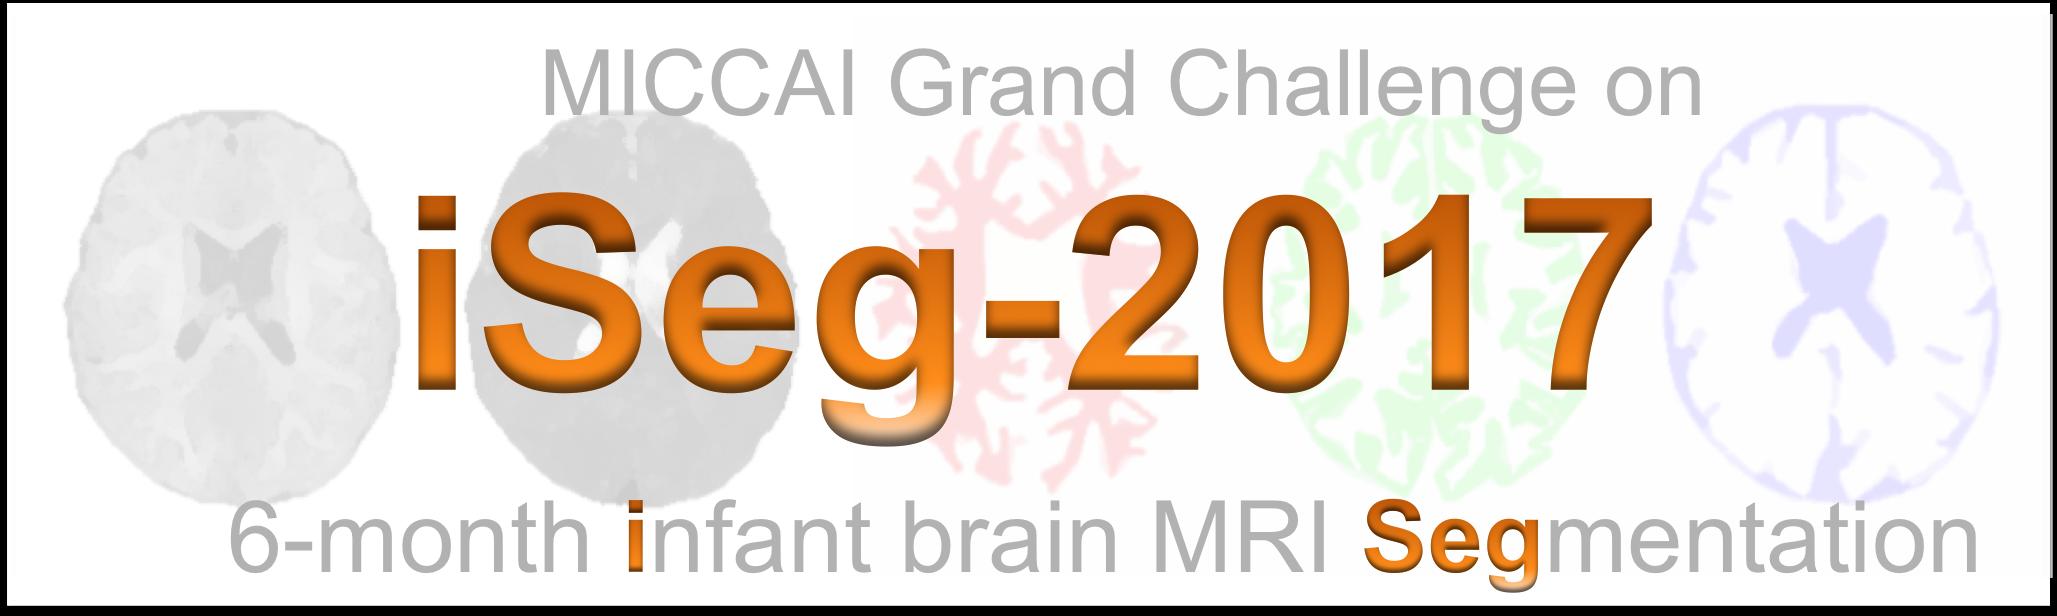 MICCAI Grand Challenge on 6-month Infant Brain MRI Segmentation